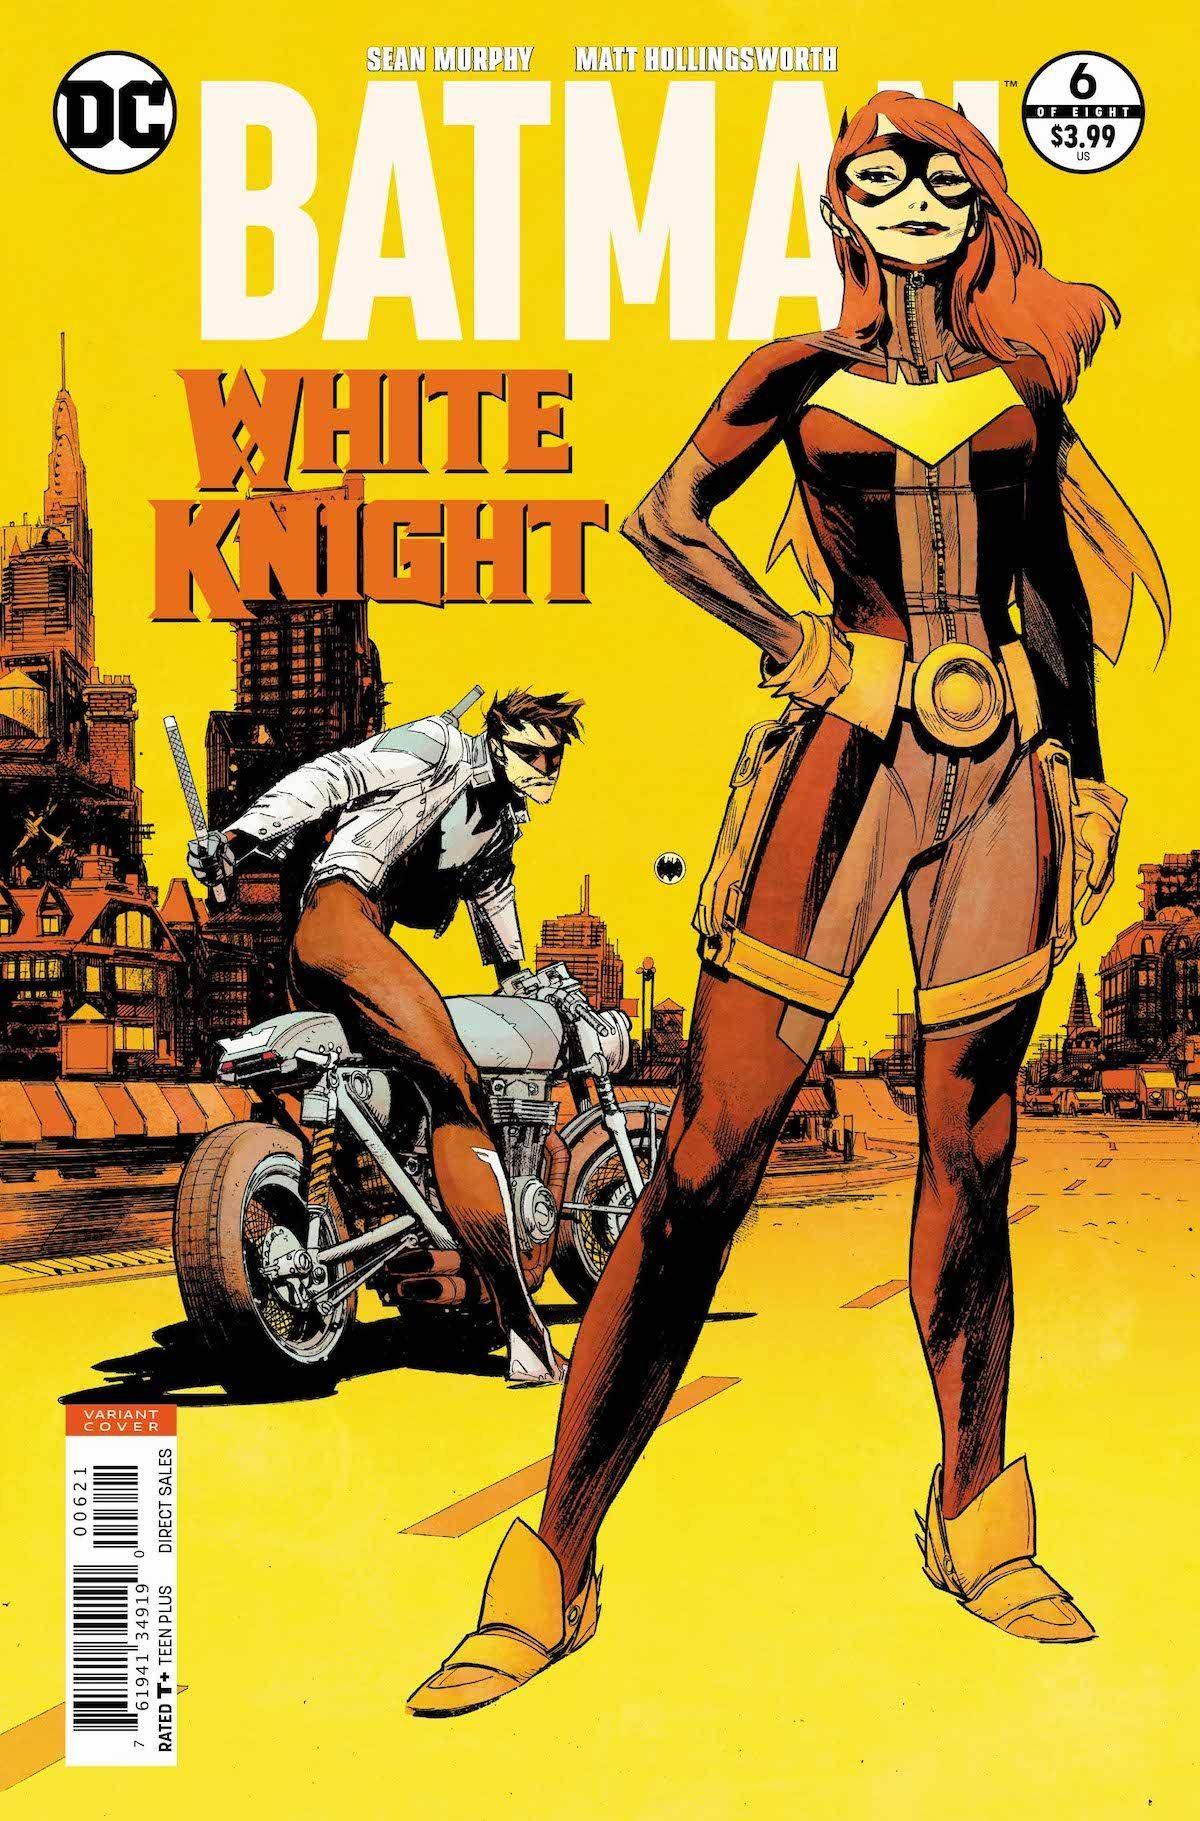 Batman: White Knight #6 variant cover